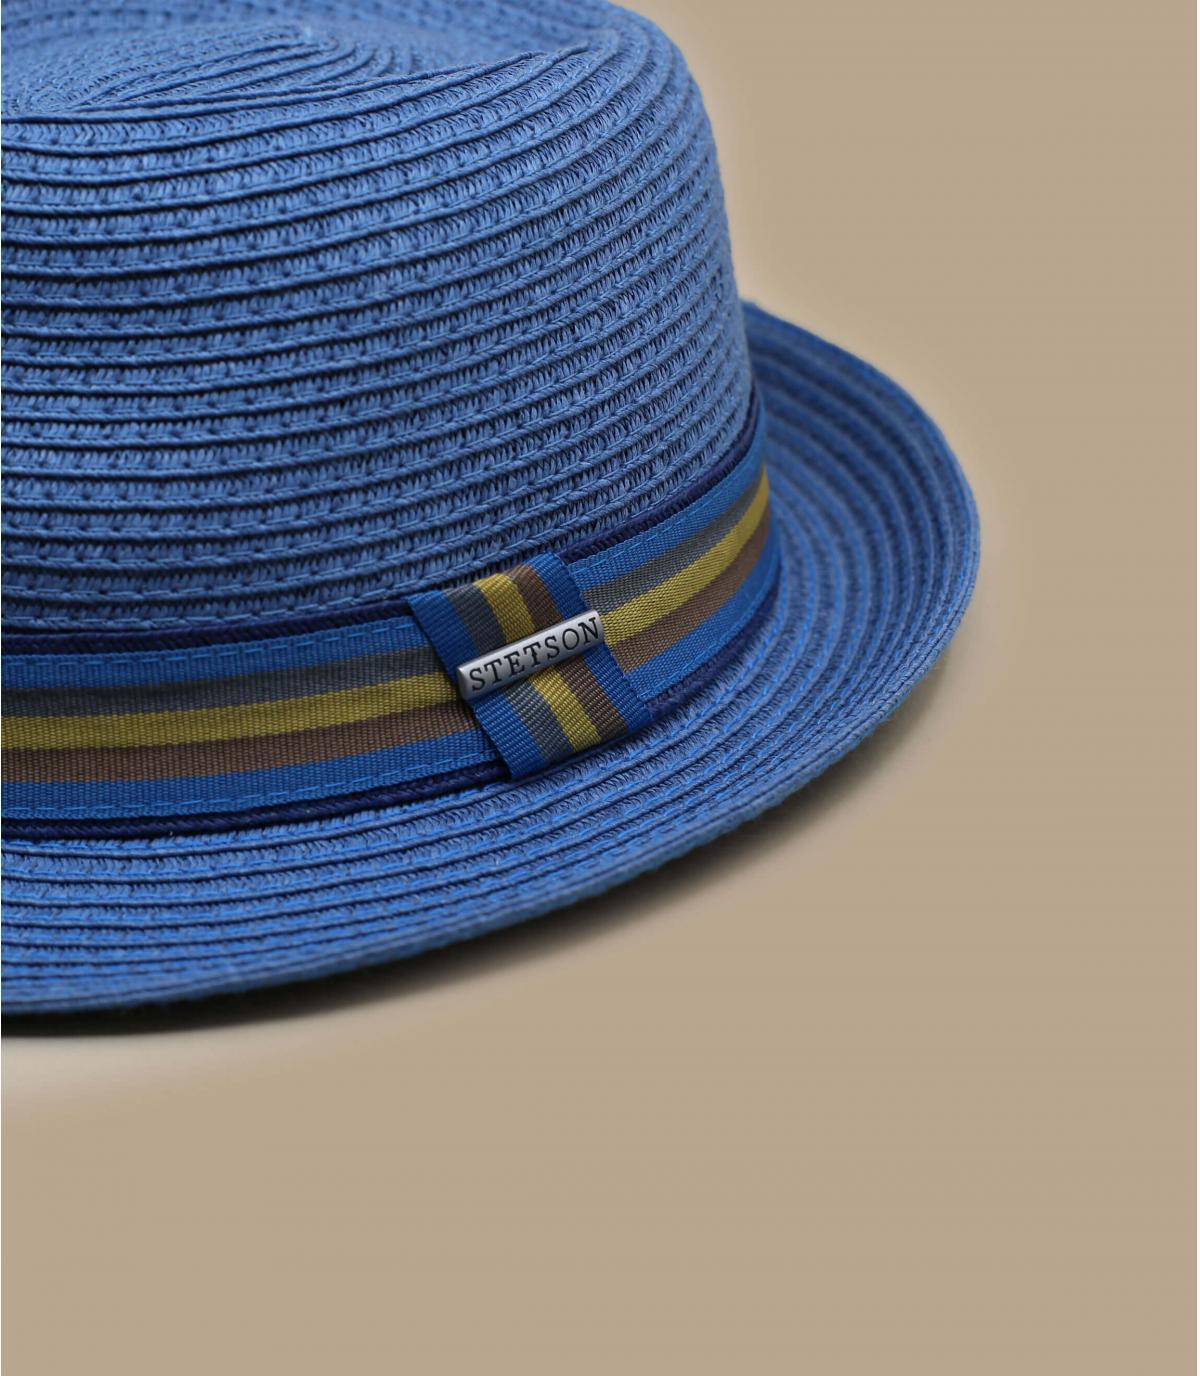 Dettagli Trilby toyo blue - image 2